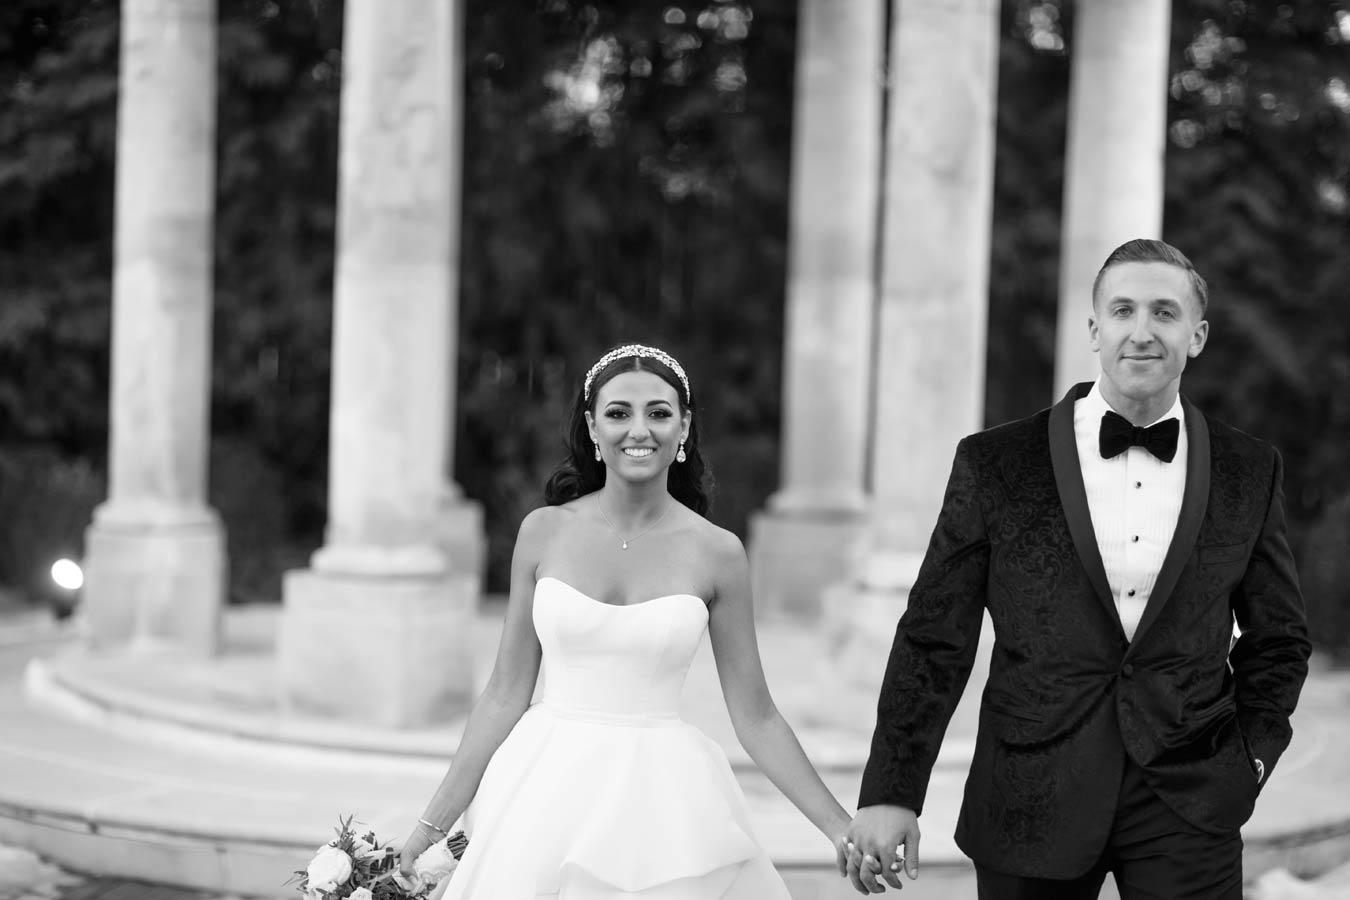 florentine-gardens-wedding-photographer-new-jersey0126.jpg